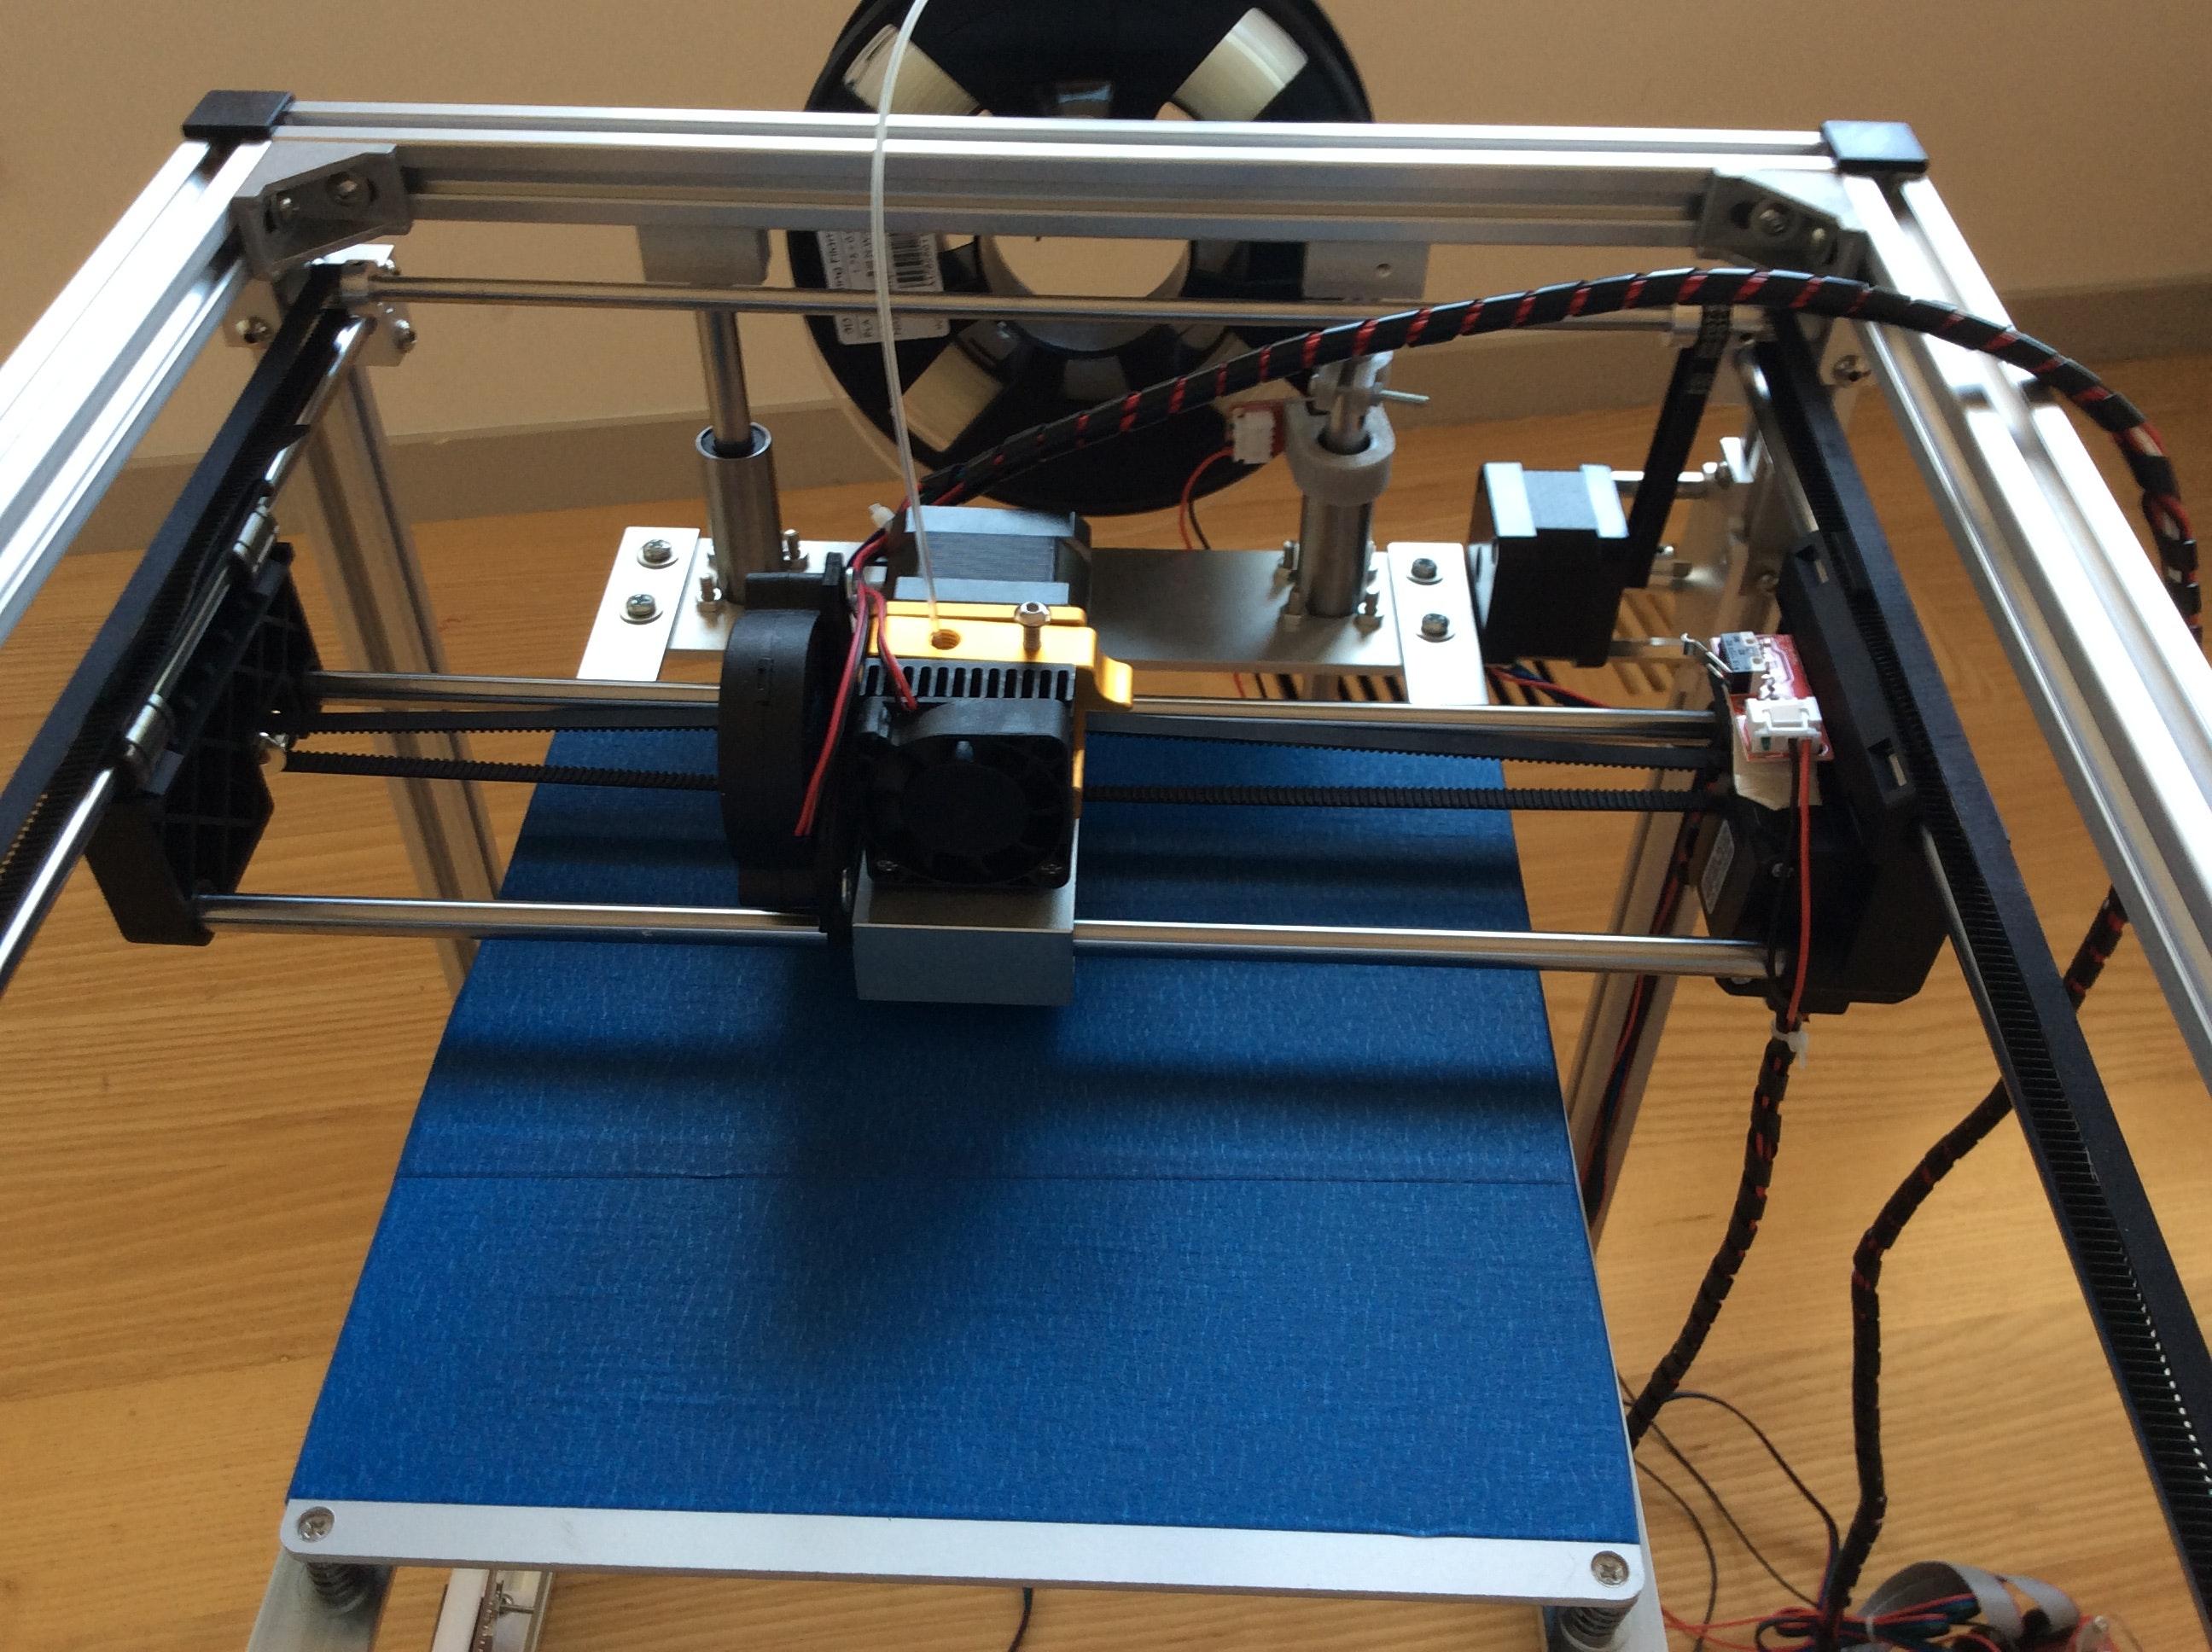 img_0006_Bbj4F8TP4w?auto=compress%2Cformat&w=680&h=510&fit=max the arduino 3d printer, flyingbear p902 arduino project hub  at fashall.co